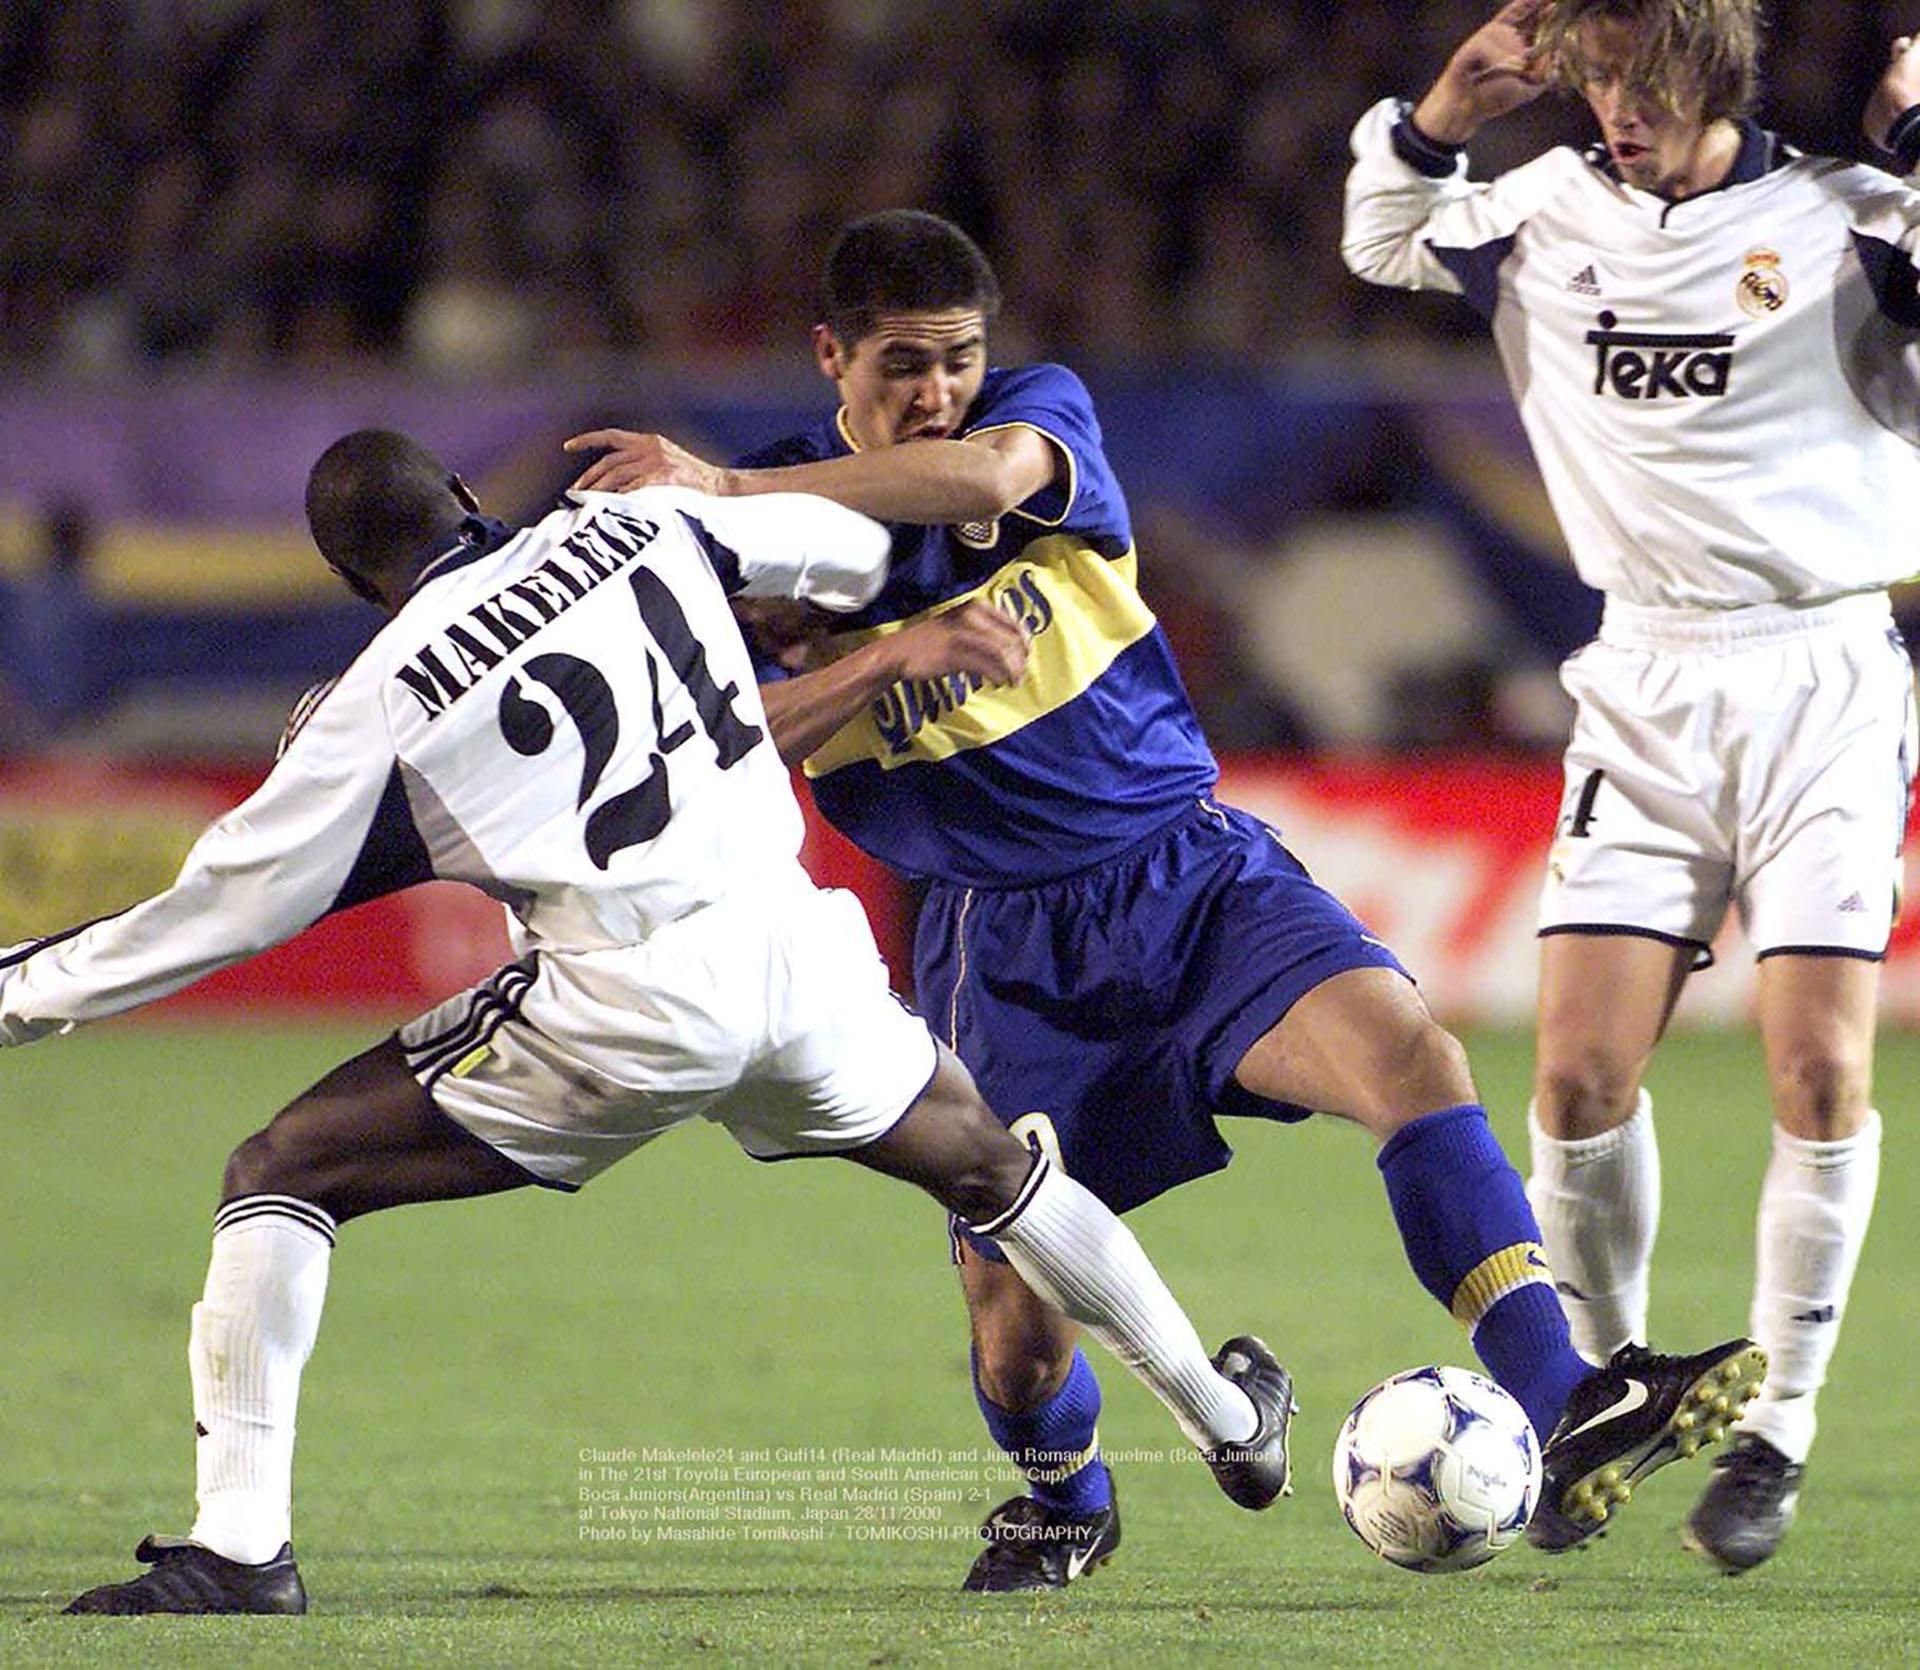 Juan Román Riquelme disputa la pelota con Makelele (Photo by Masahide Tomikoshi / TOMIKOSHI PHOTOGRAPHY @tphoto2005)